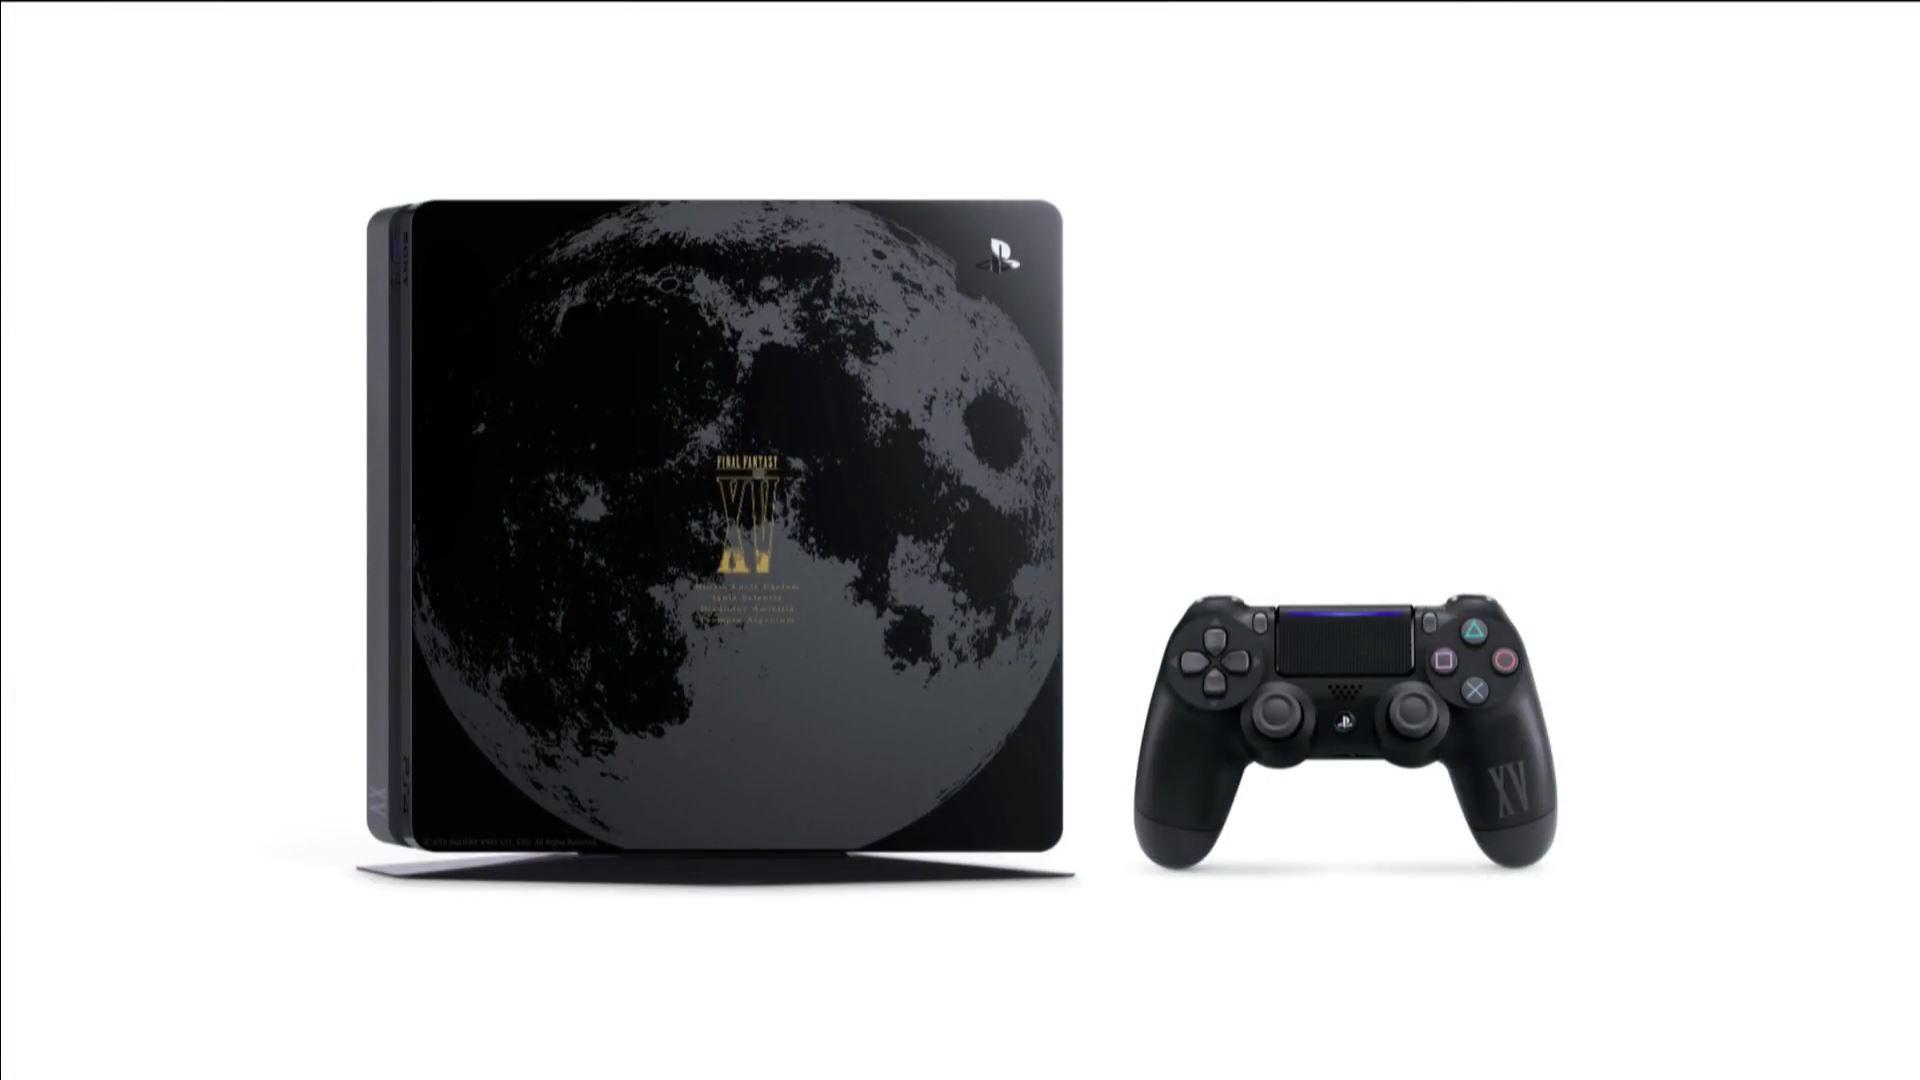 FinalFantasyXV PS4 Div 131